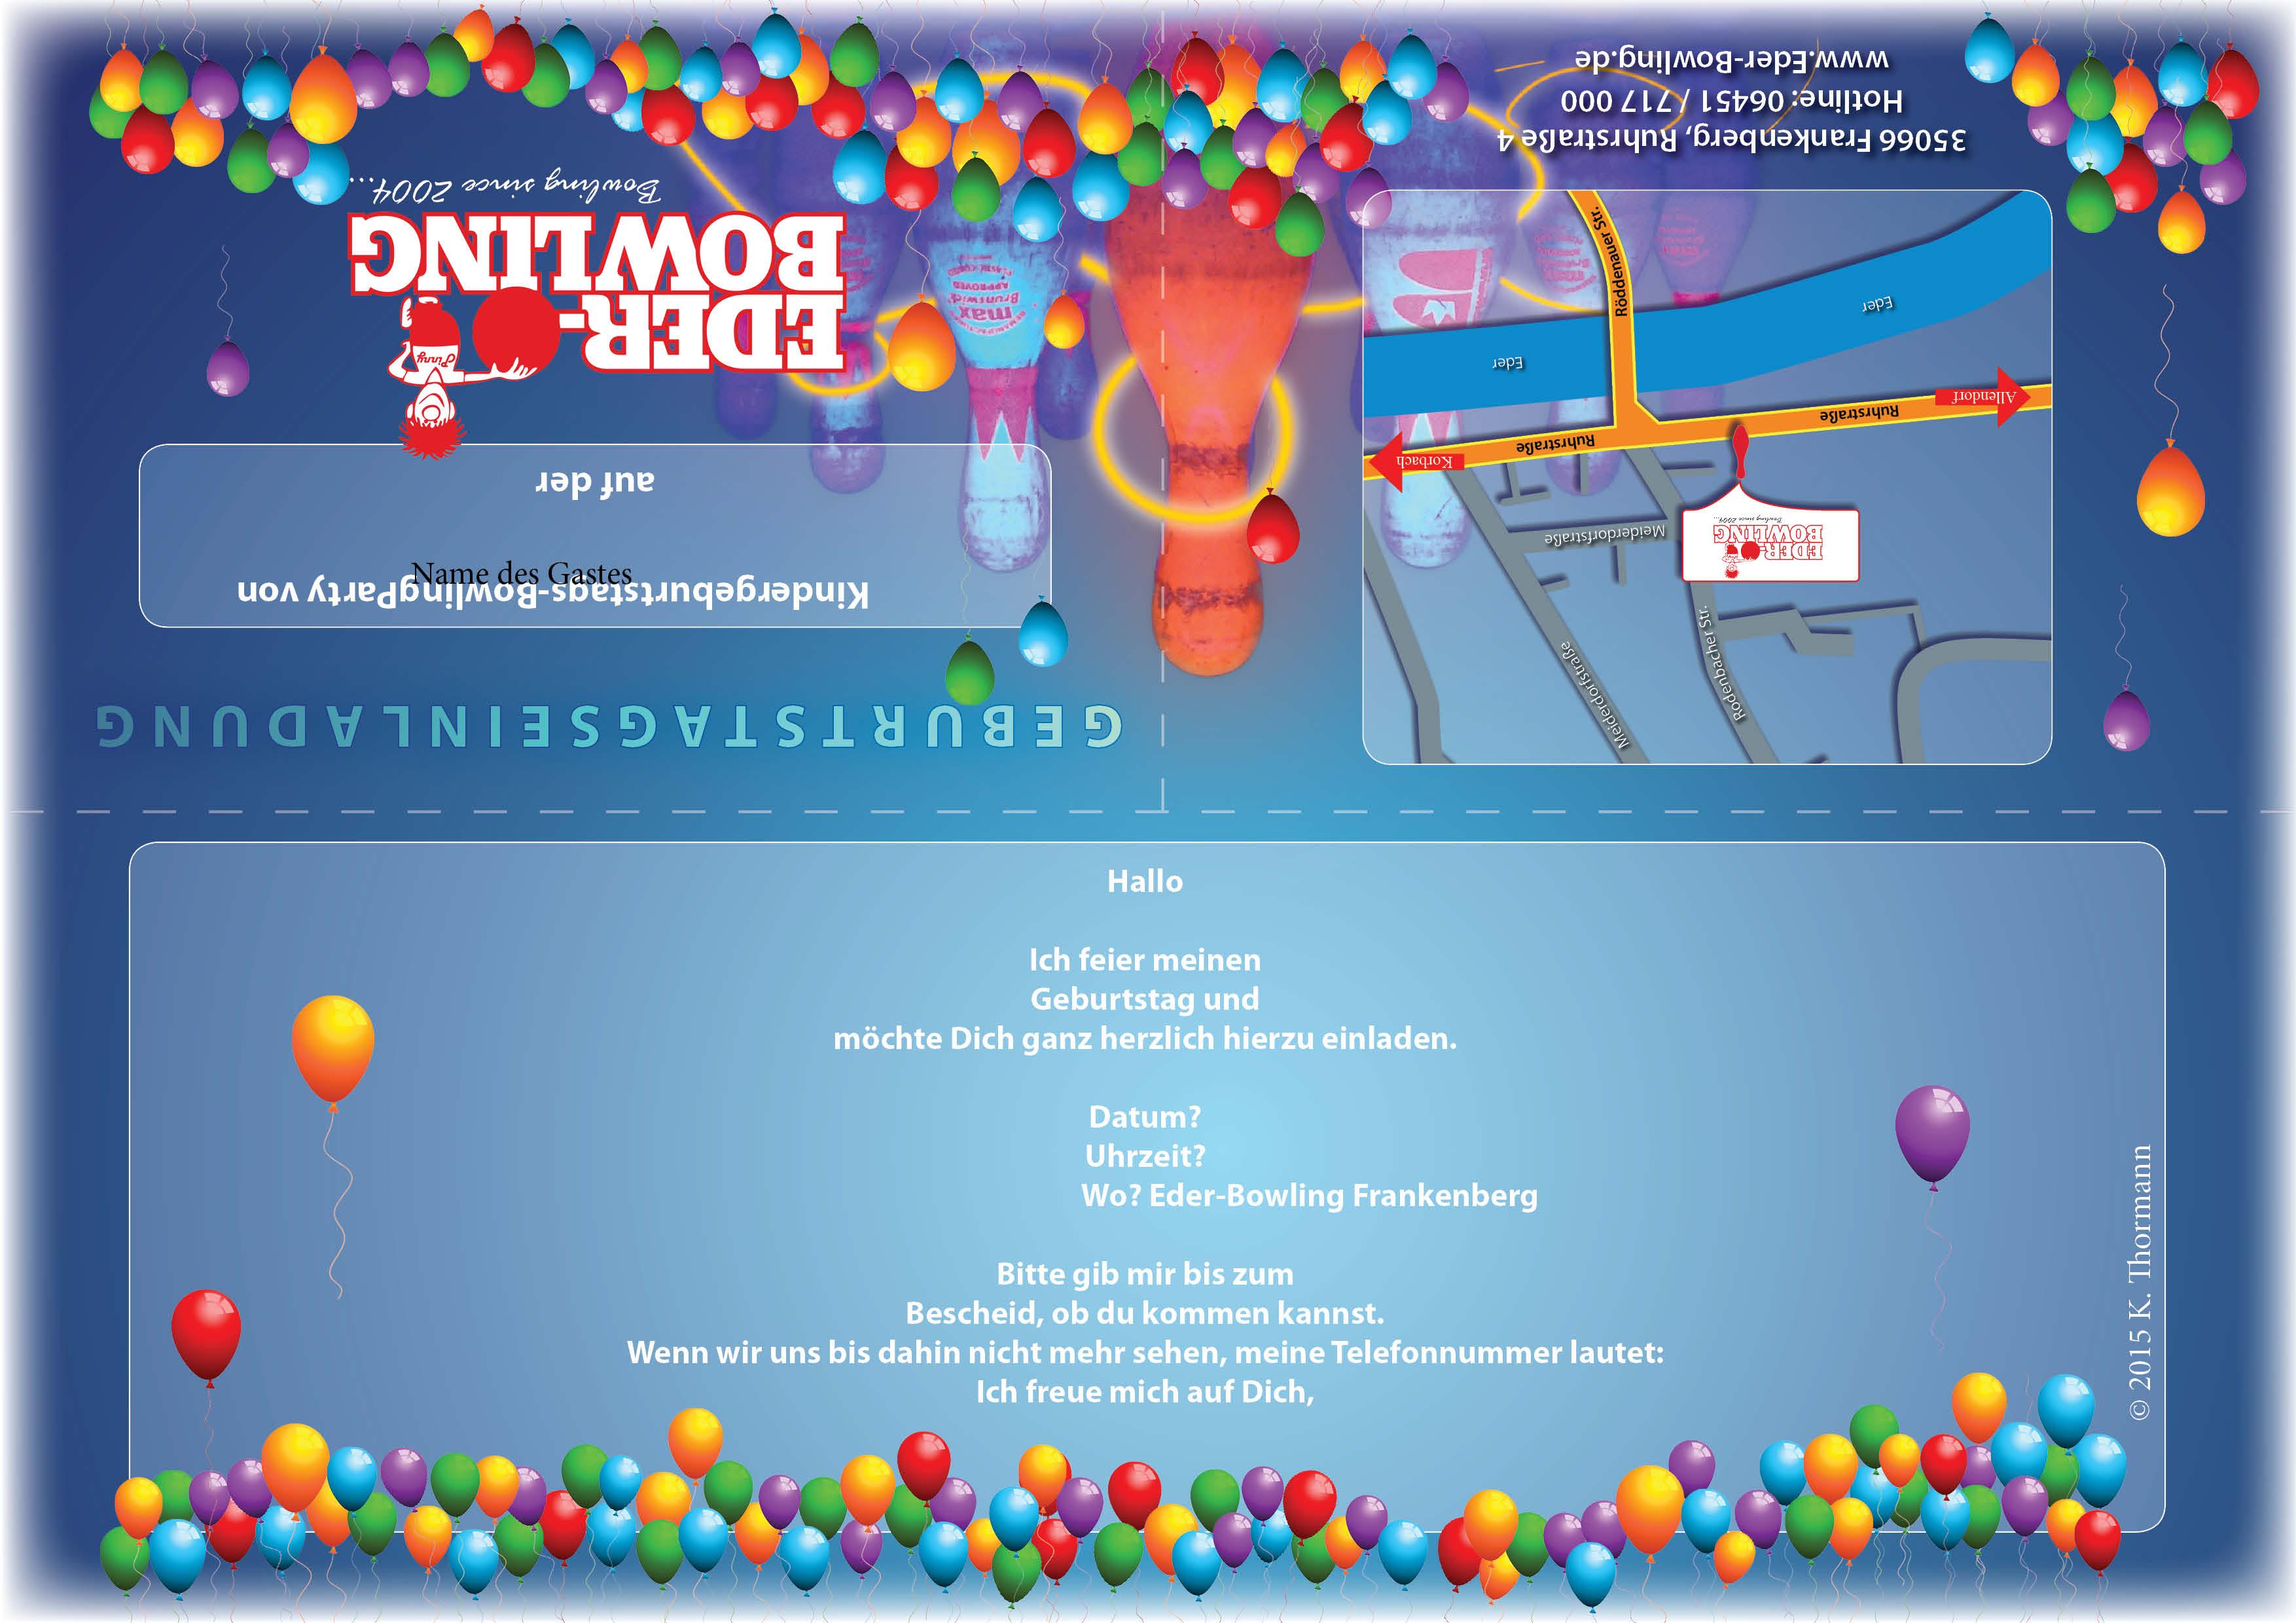 Einladung Zum Bowling: Eder-Bowling Frankenberg